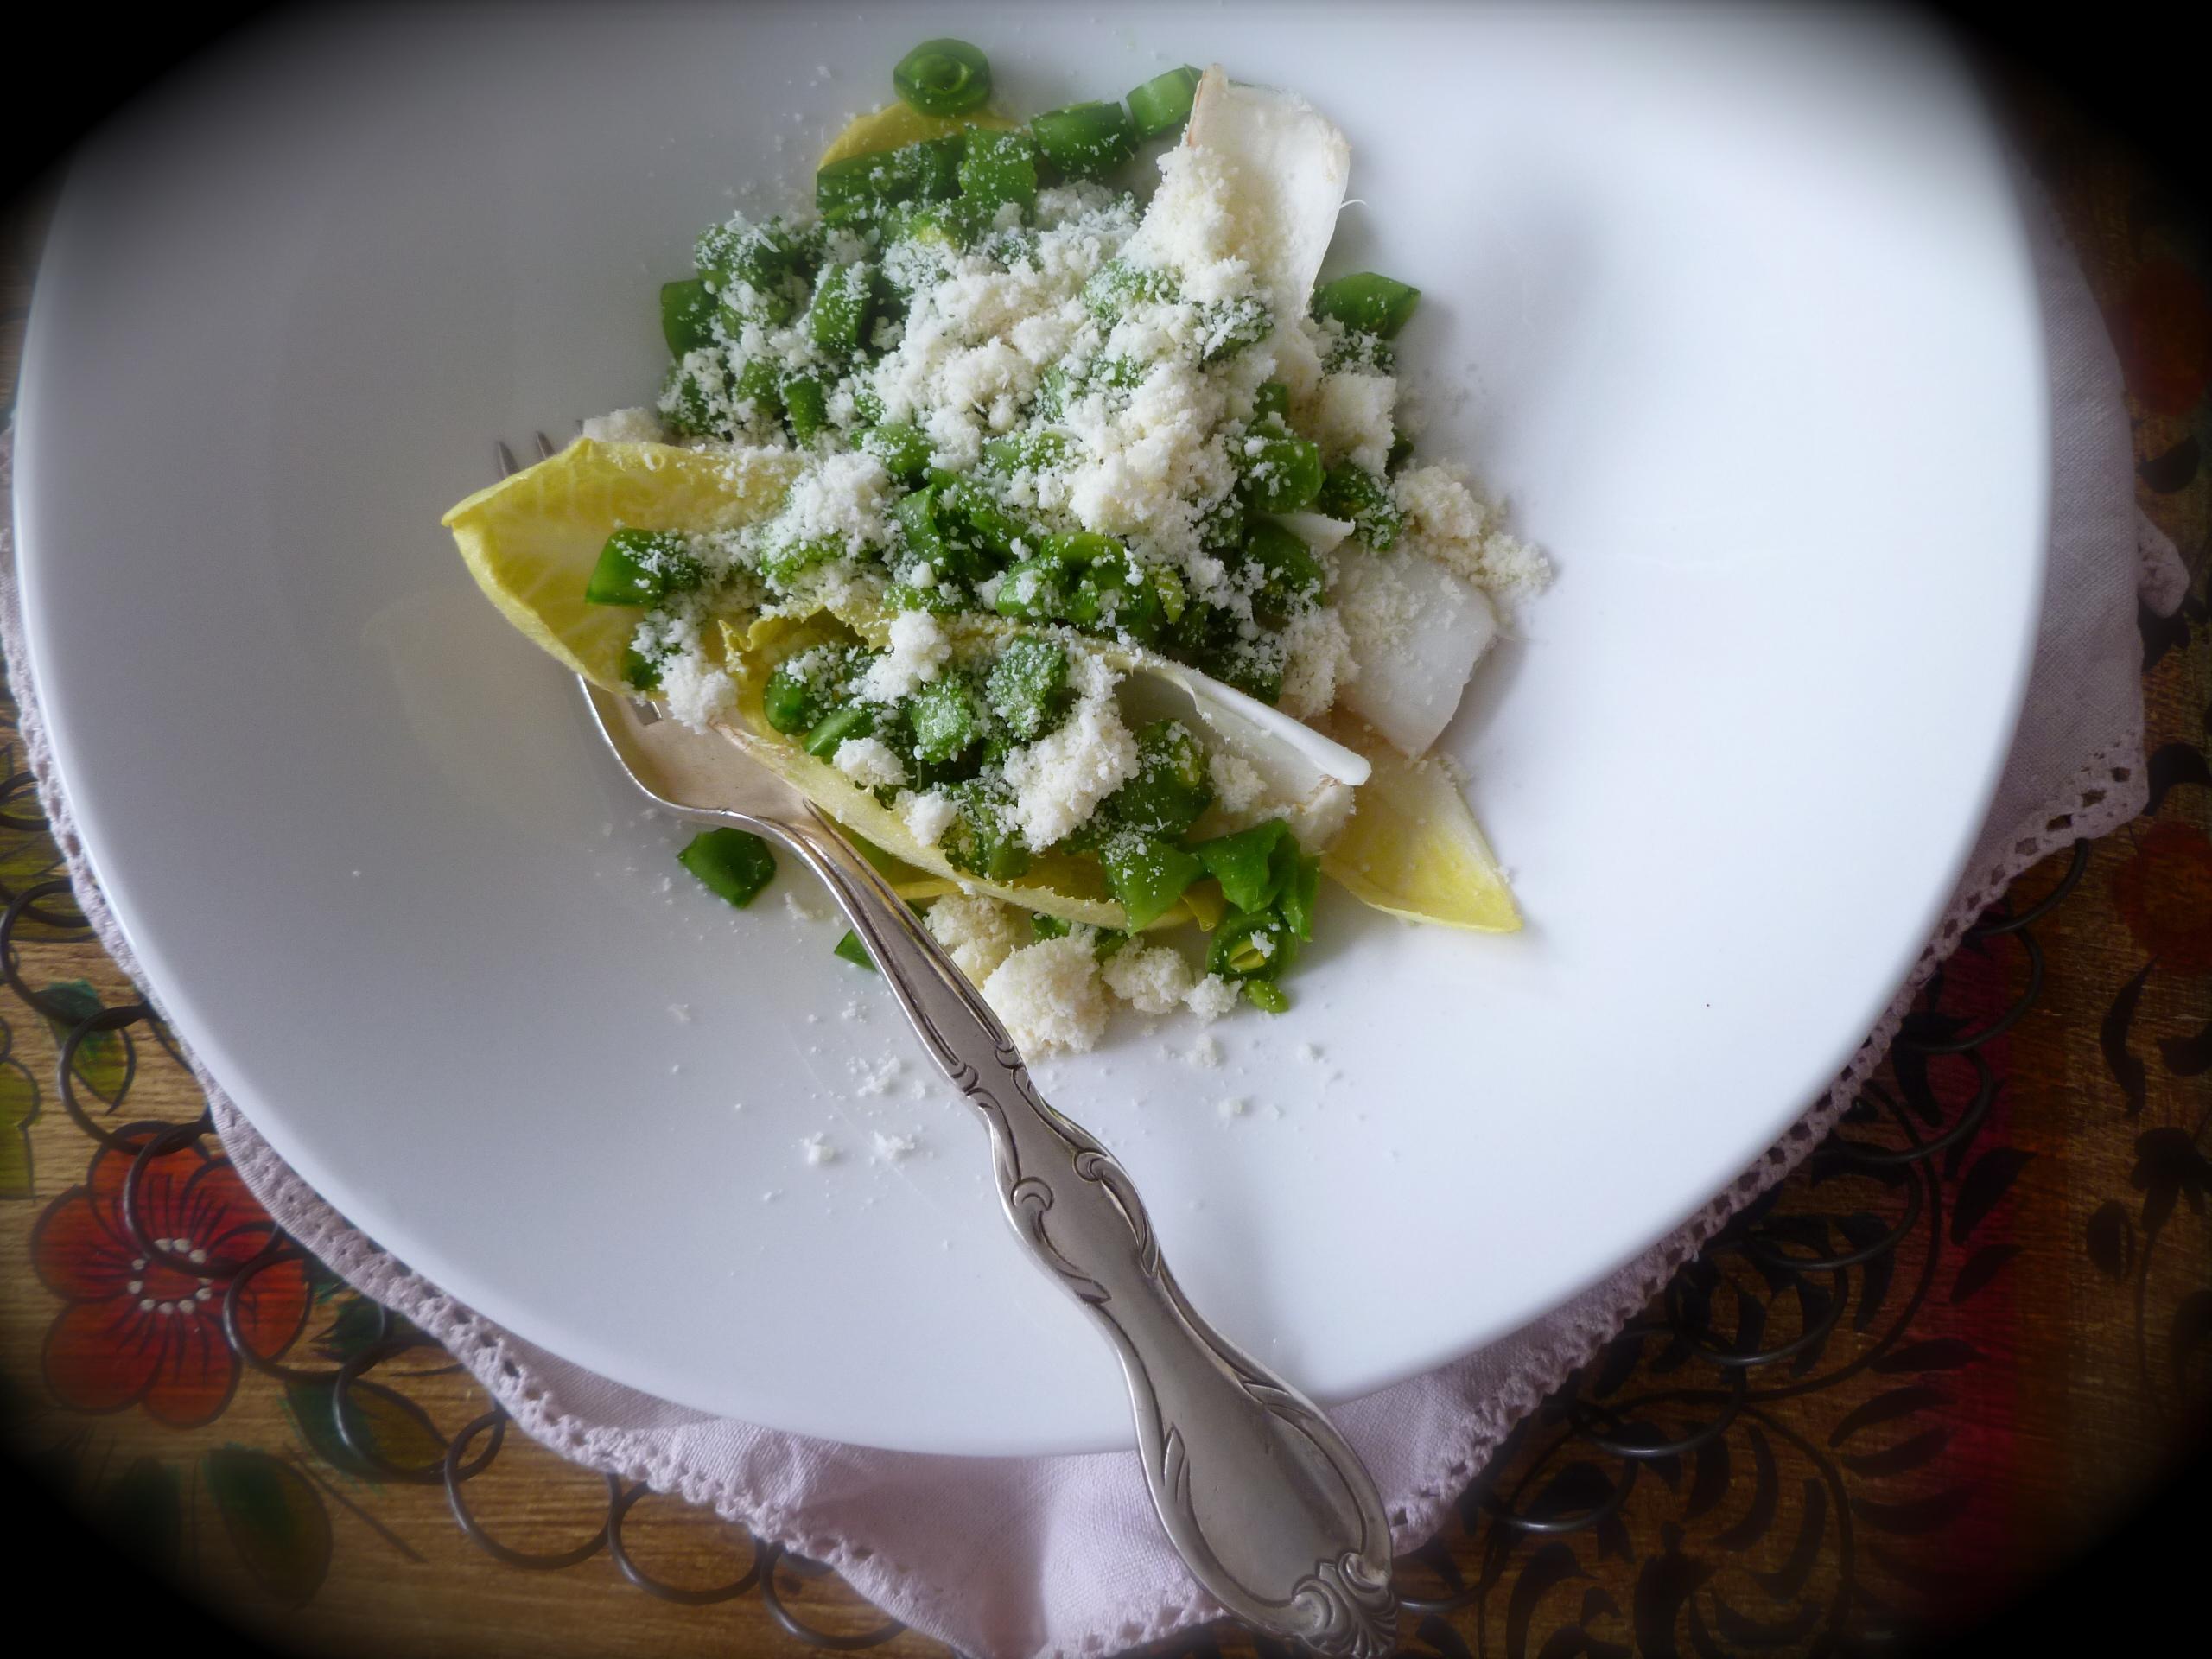 snap pea salad sugar snap pea salad maura sugar snap peas endive salad ...